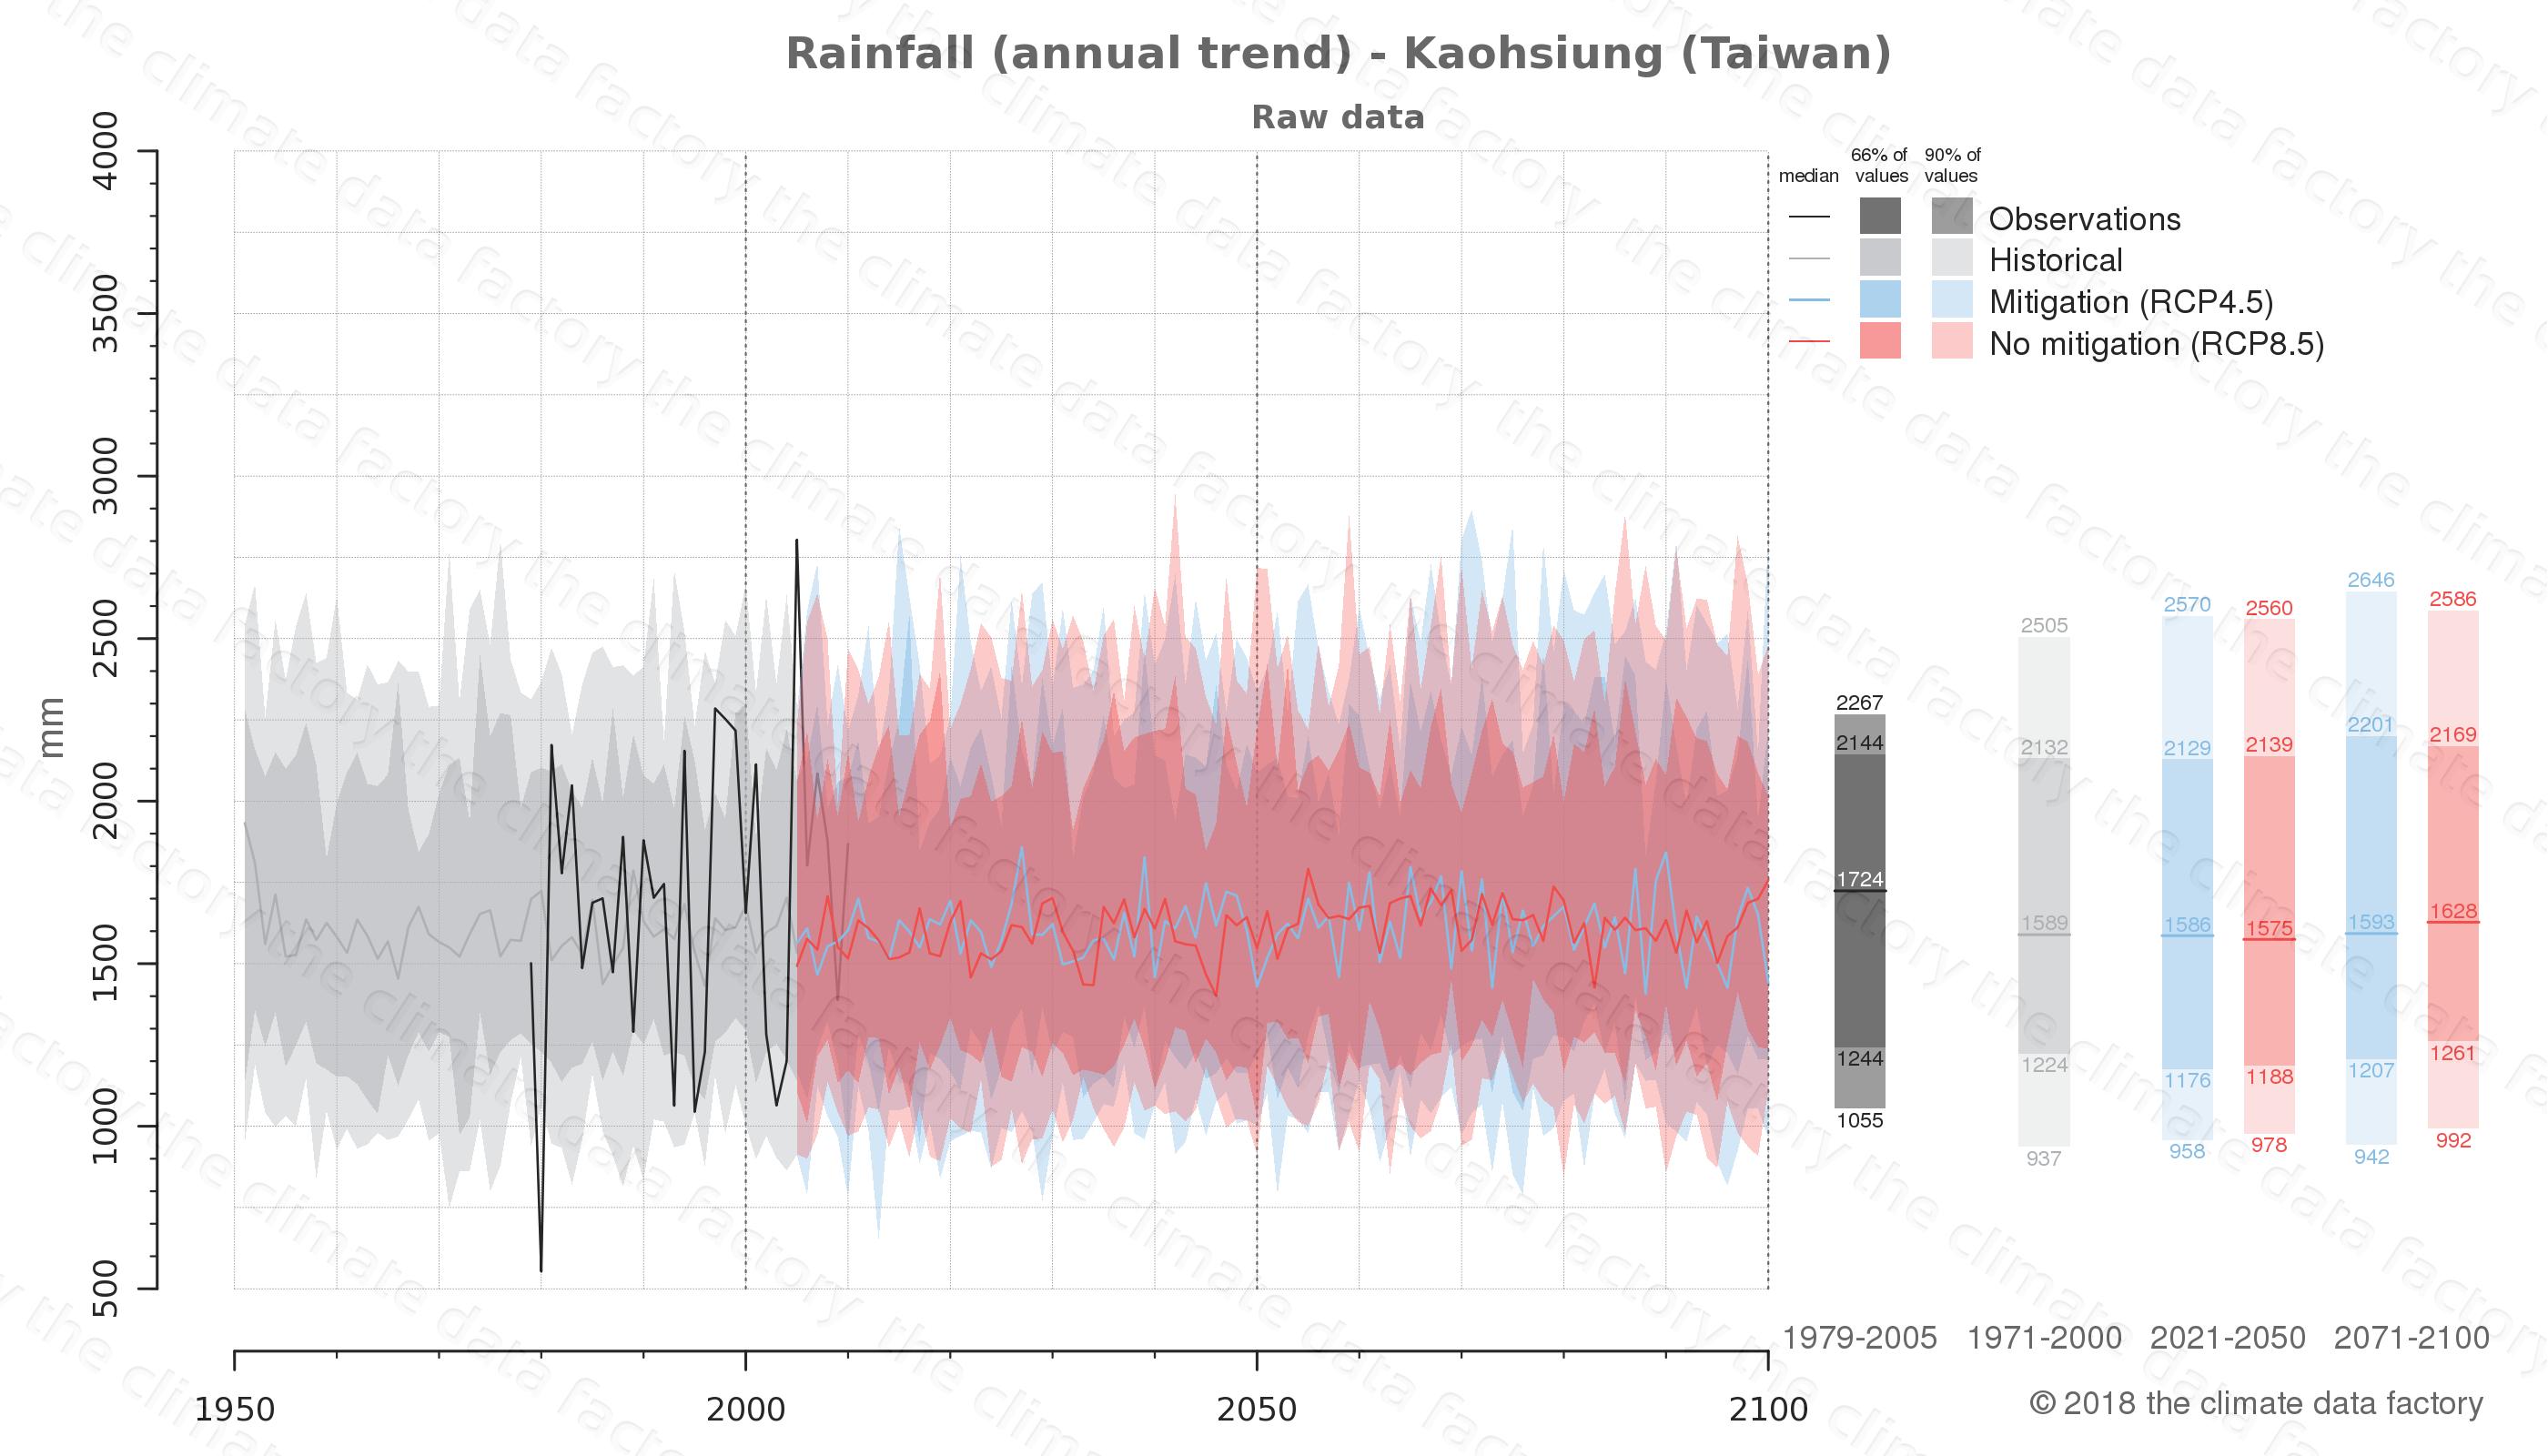 climate change data policy adaptation climate graph city data rainfall kaohsiung taiwan